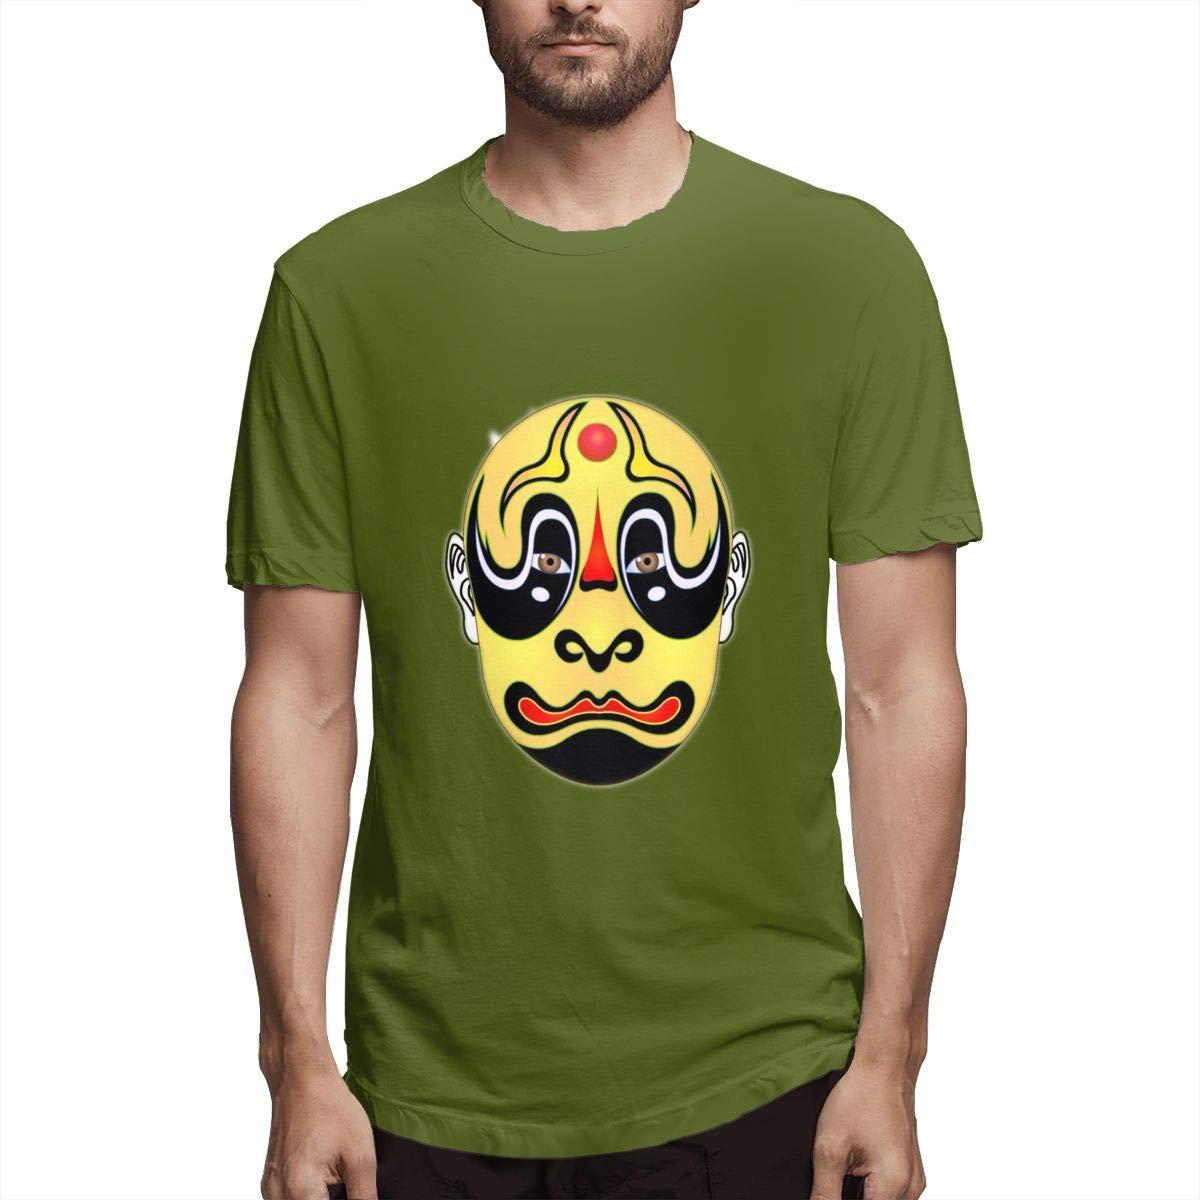 LONGTENG Design Halloween Horror Ghost Fashion Shirt O-Neck Pure Cotton for Boys Black